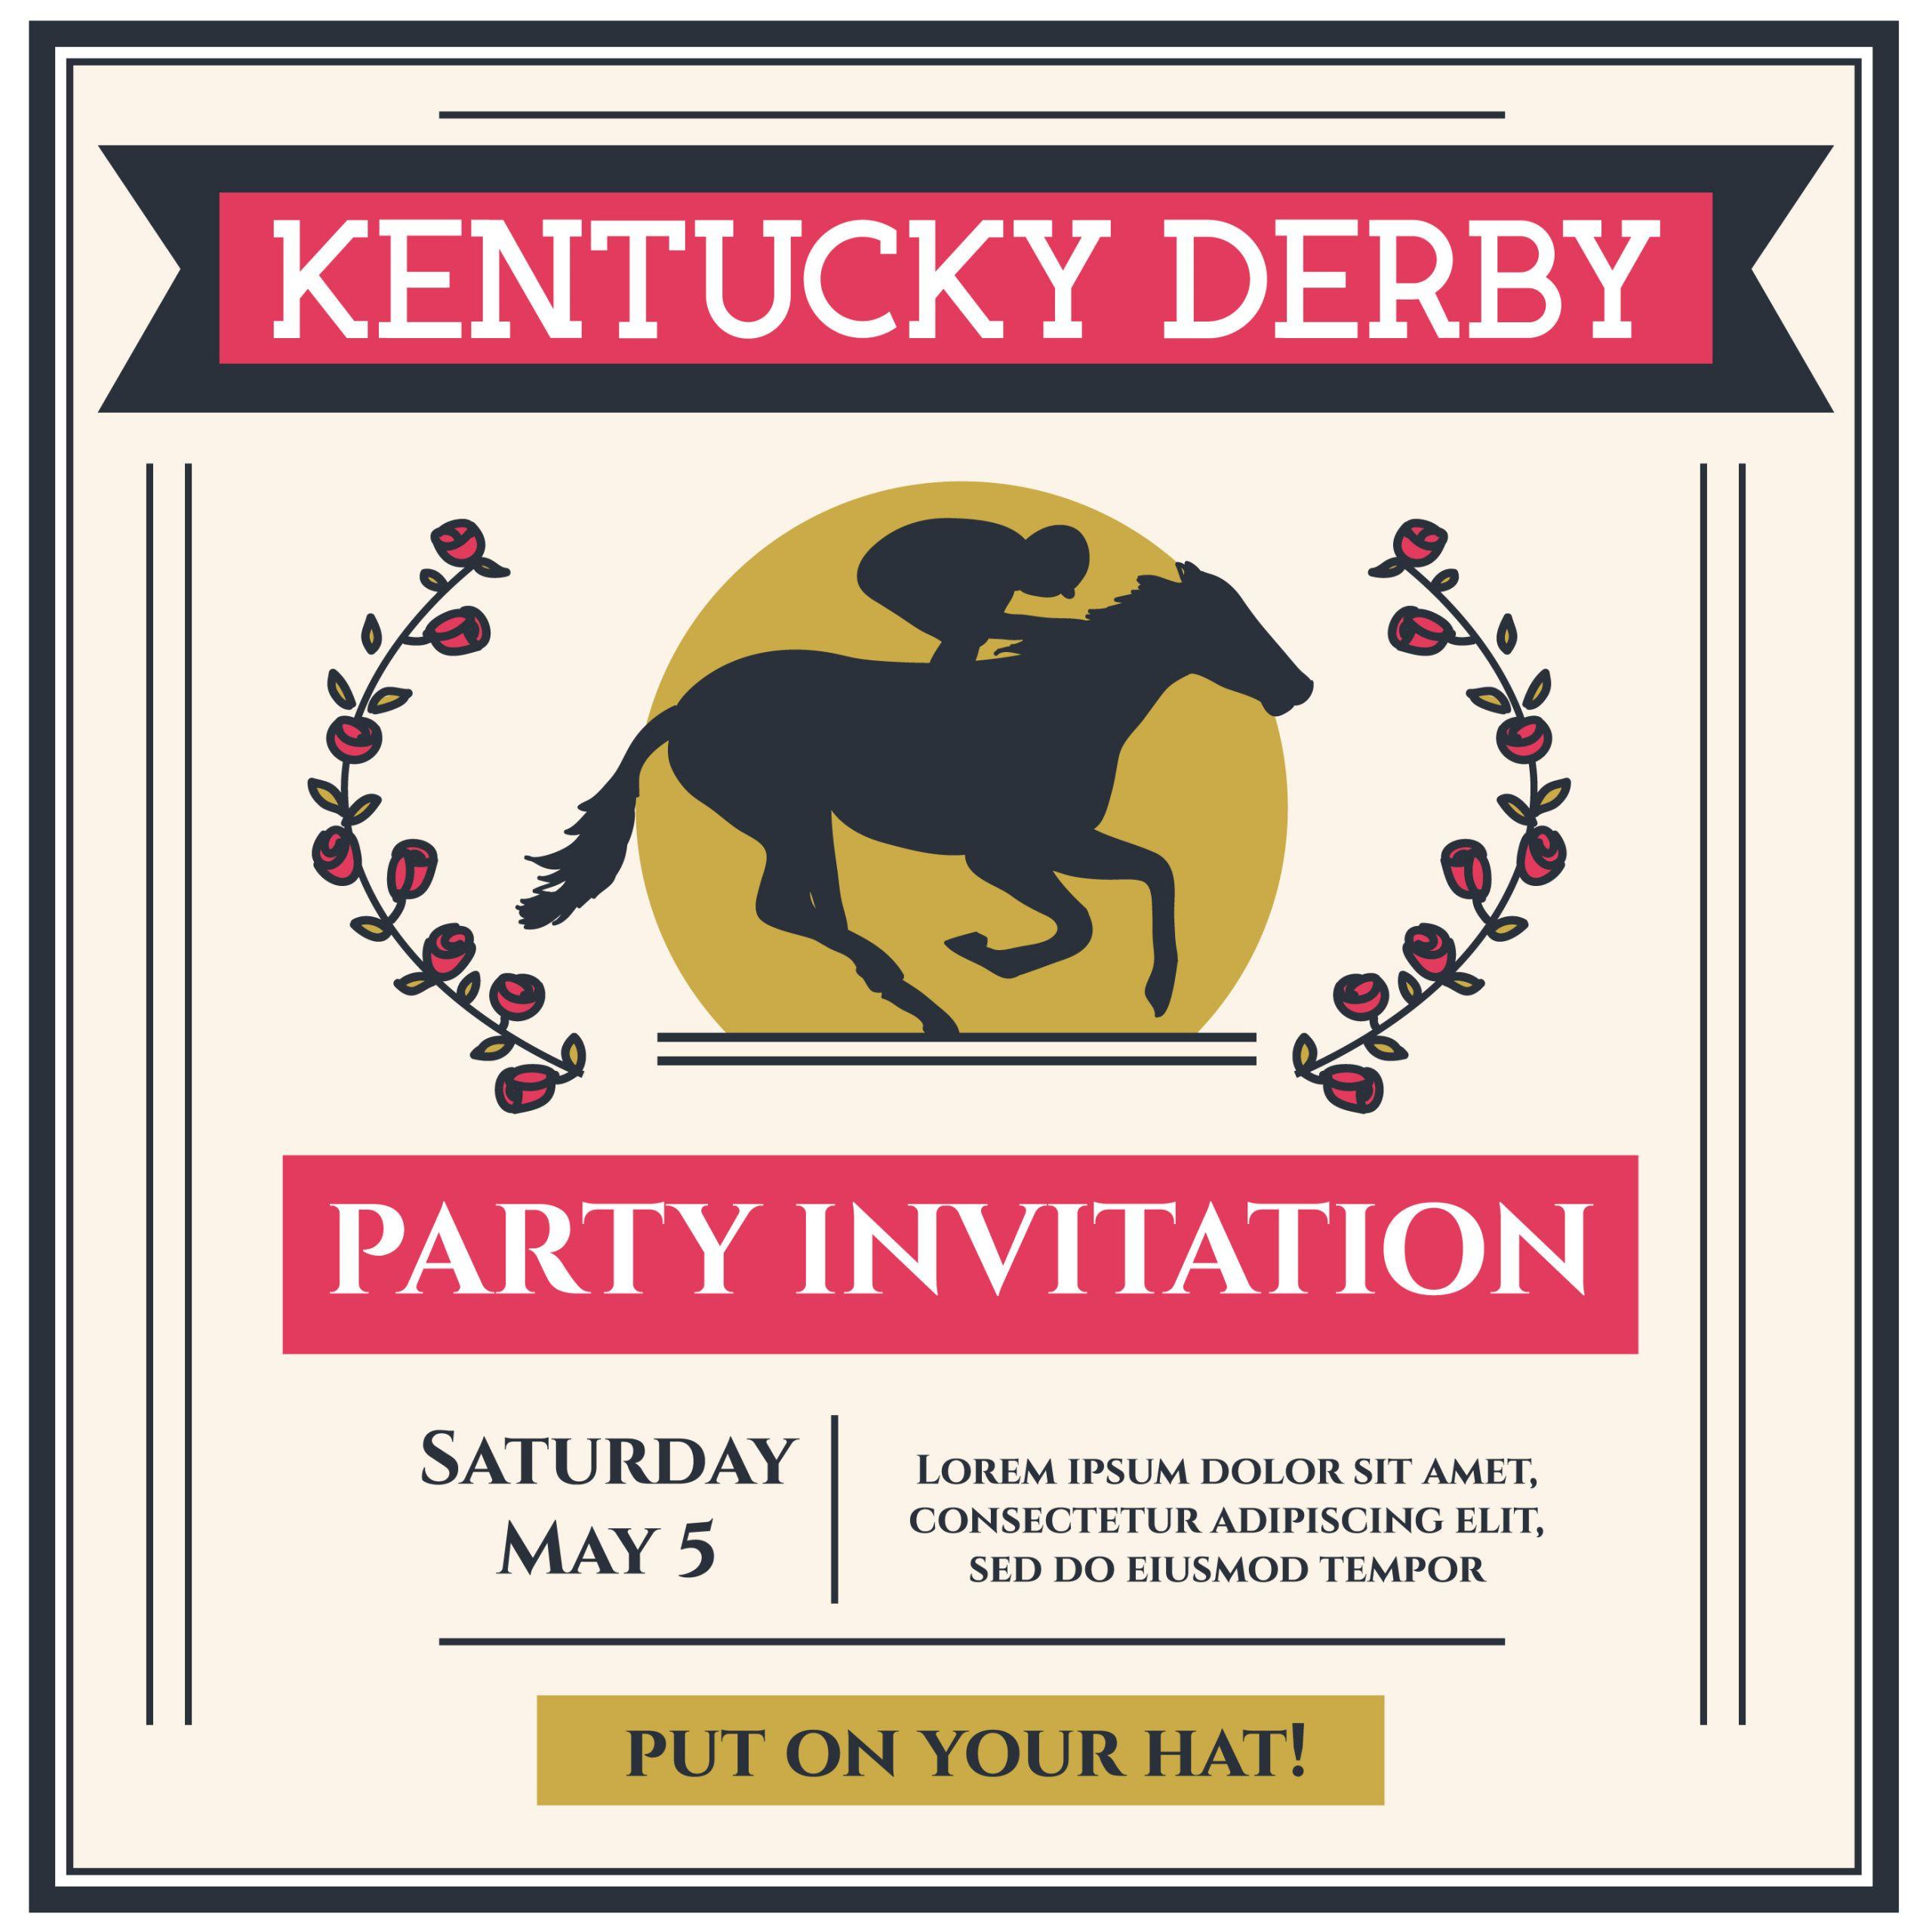 198644 kentucky derby party invitation vector